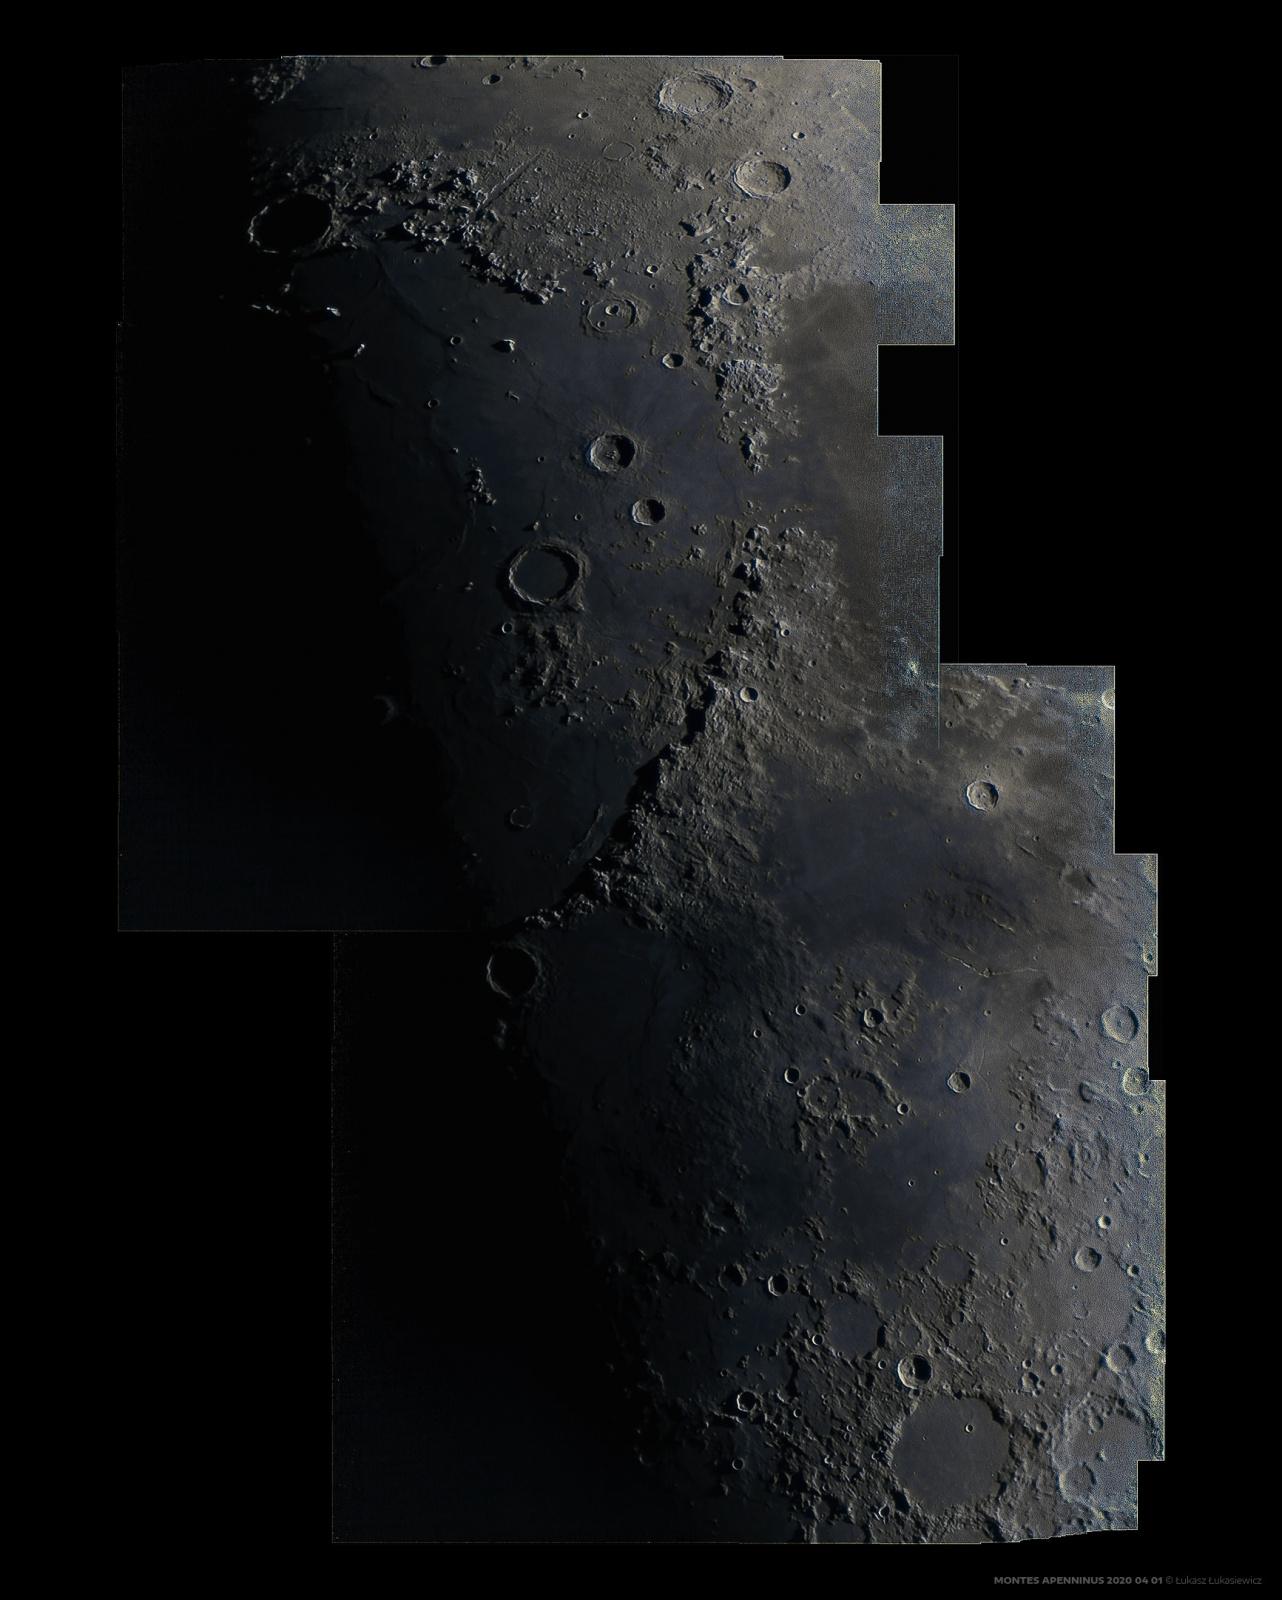 MONTES-APENNINUS-2020-04-01.thumb.jpg.06506c8315a11d2334b89f3d92192cc5.jpg